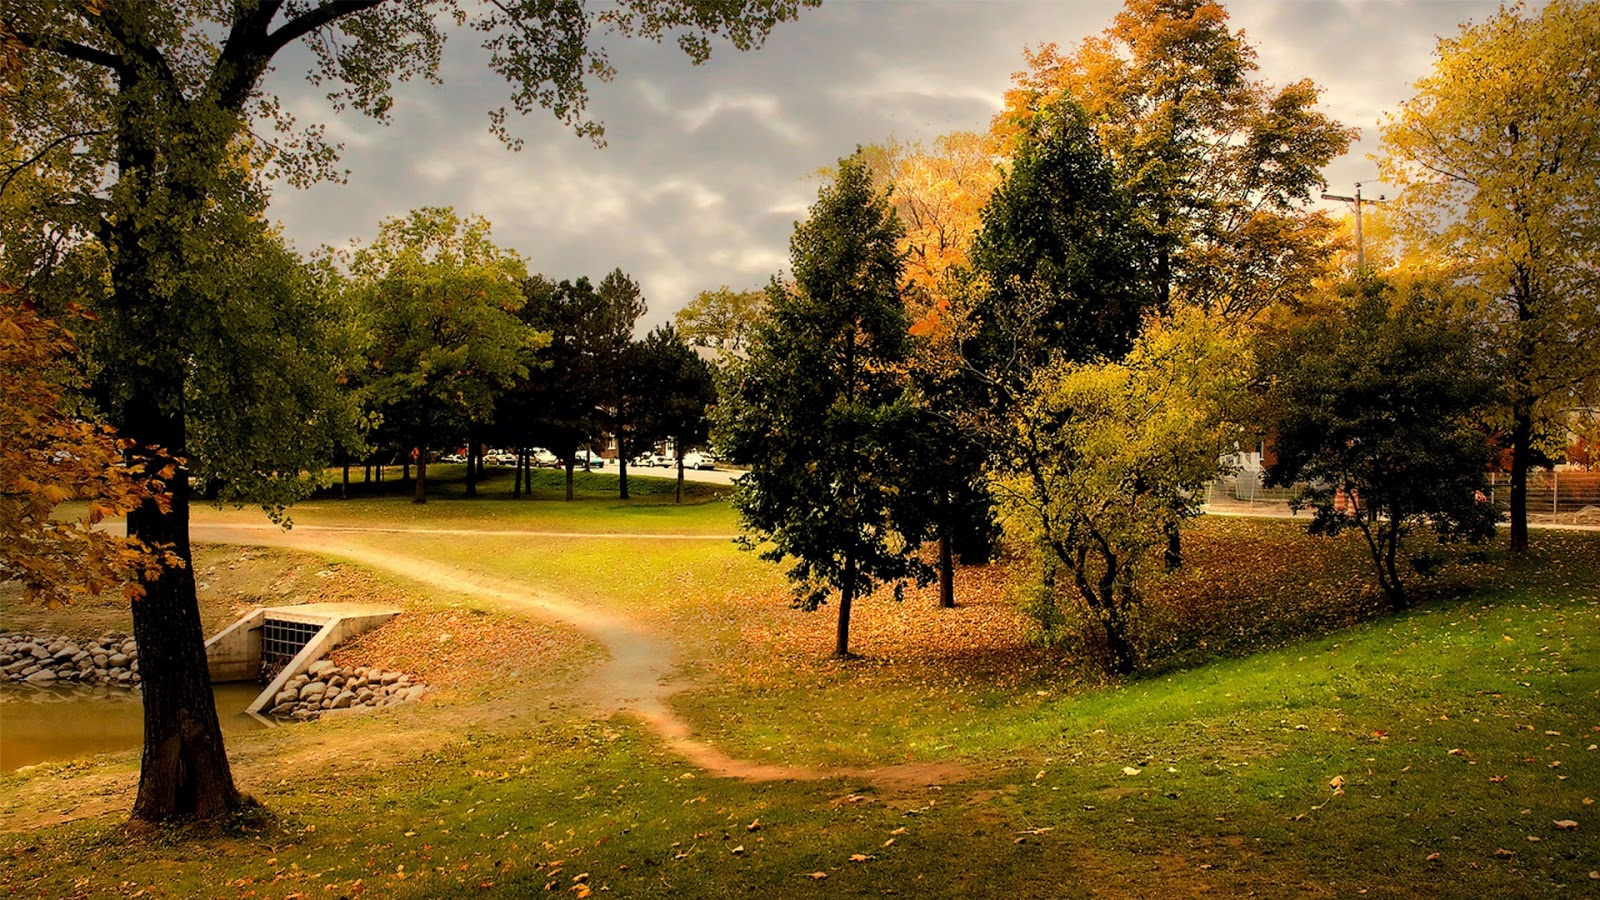 landscape hd wallpapers definition background